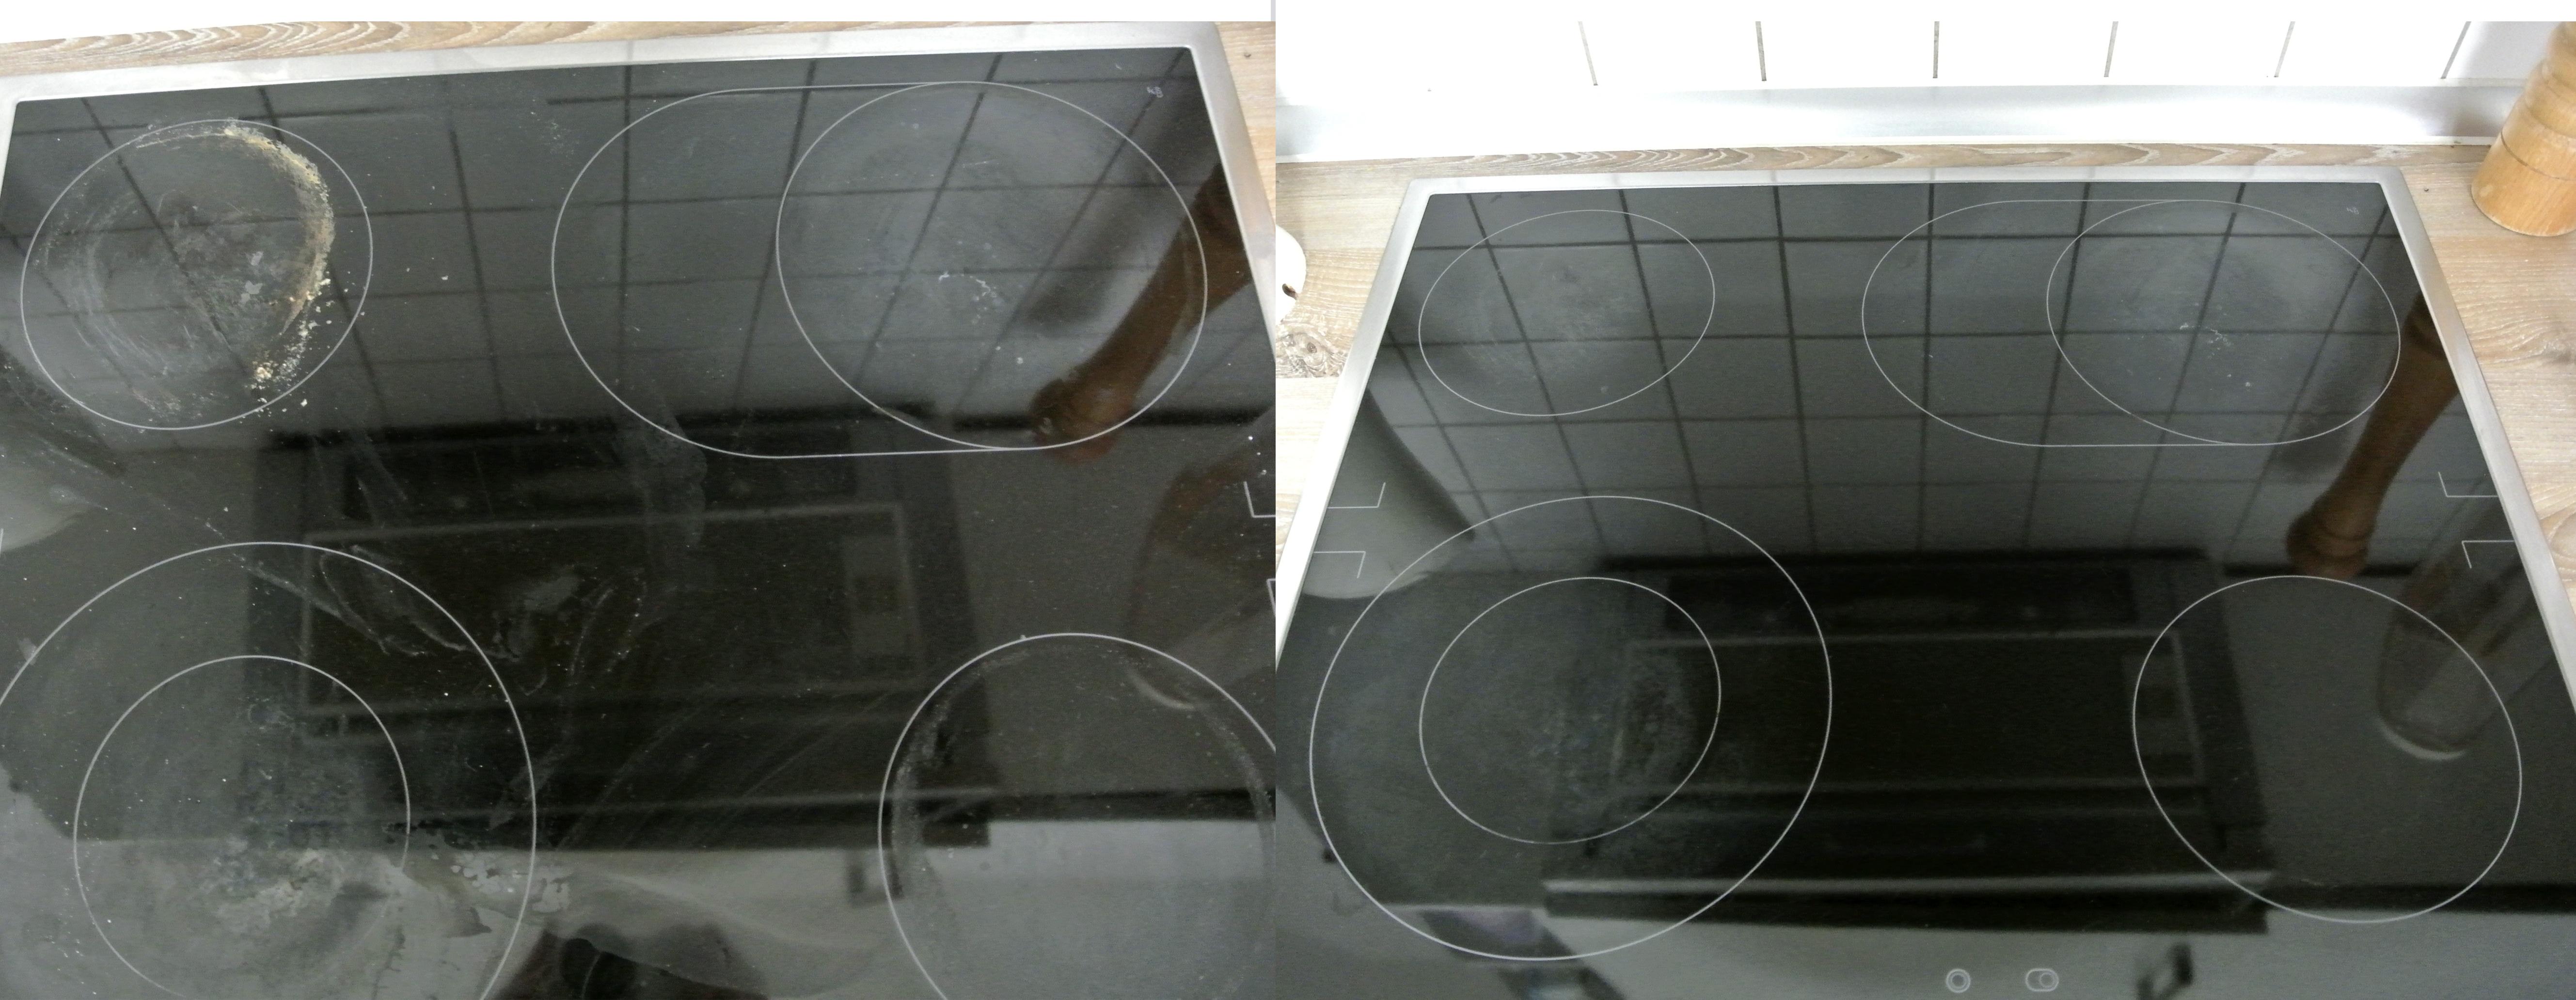 rosanisiert produkttest clean o fox werbung rosanisiert. Black Bedroom Furniture Sets. Home Design Ideas